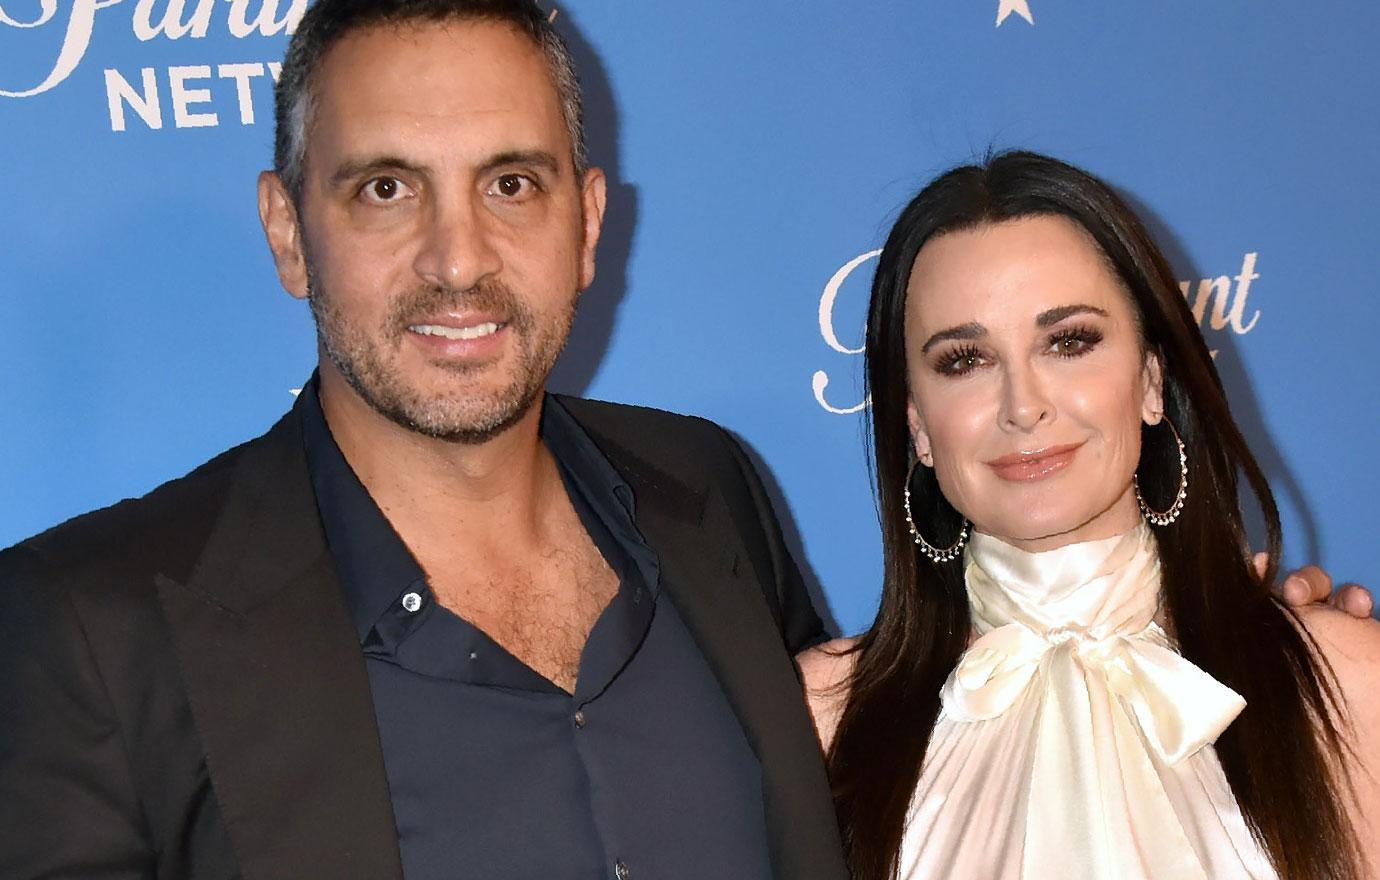 Kyle Richards Husband Mauricio Setback Malibu Mansion Lawsuit